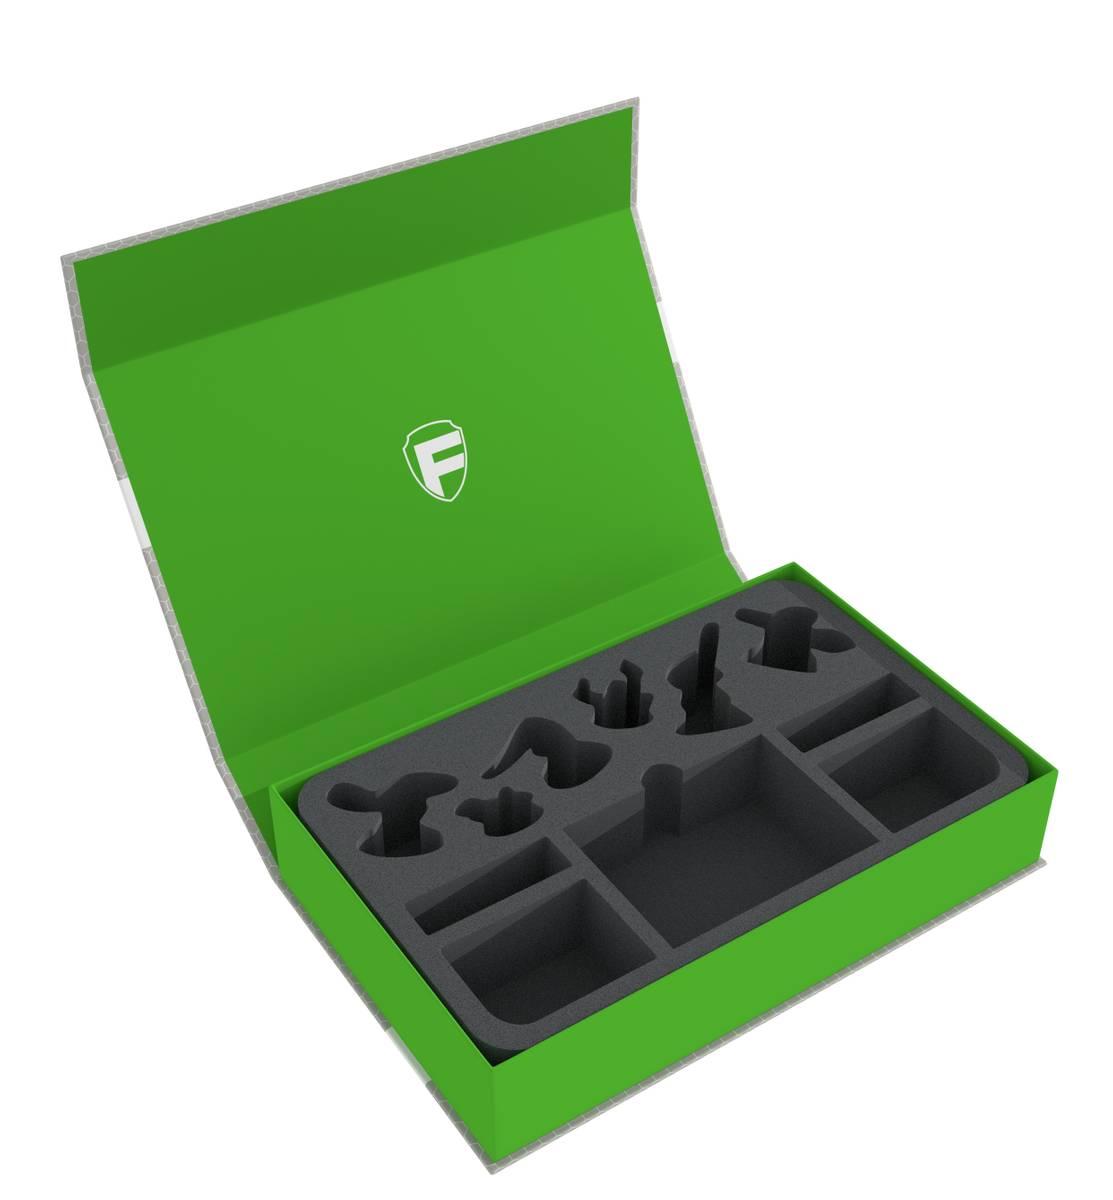 Feldherr Magnetic Box green for Warhammer Underworlds: Nightvault - Eyes of the Nine